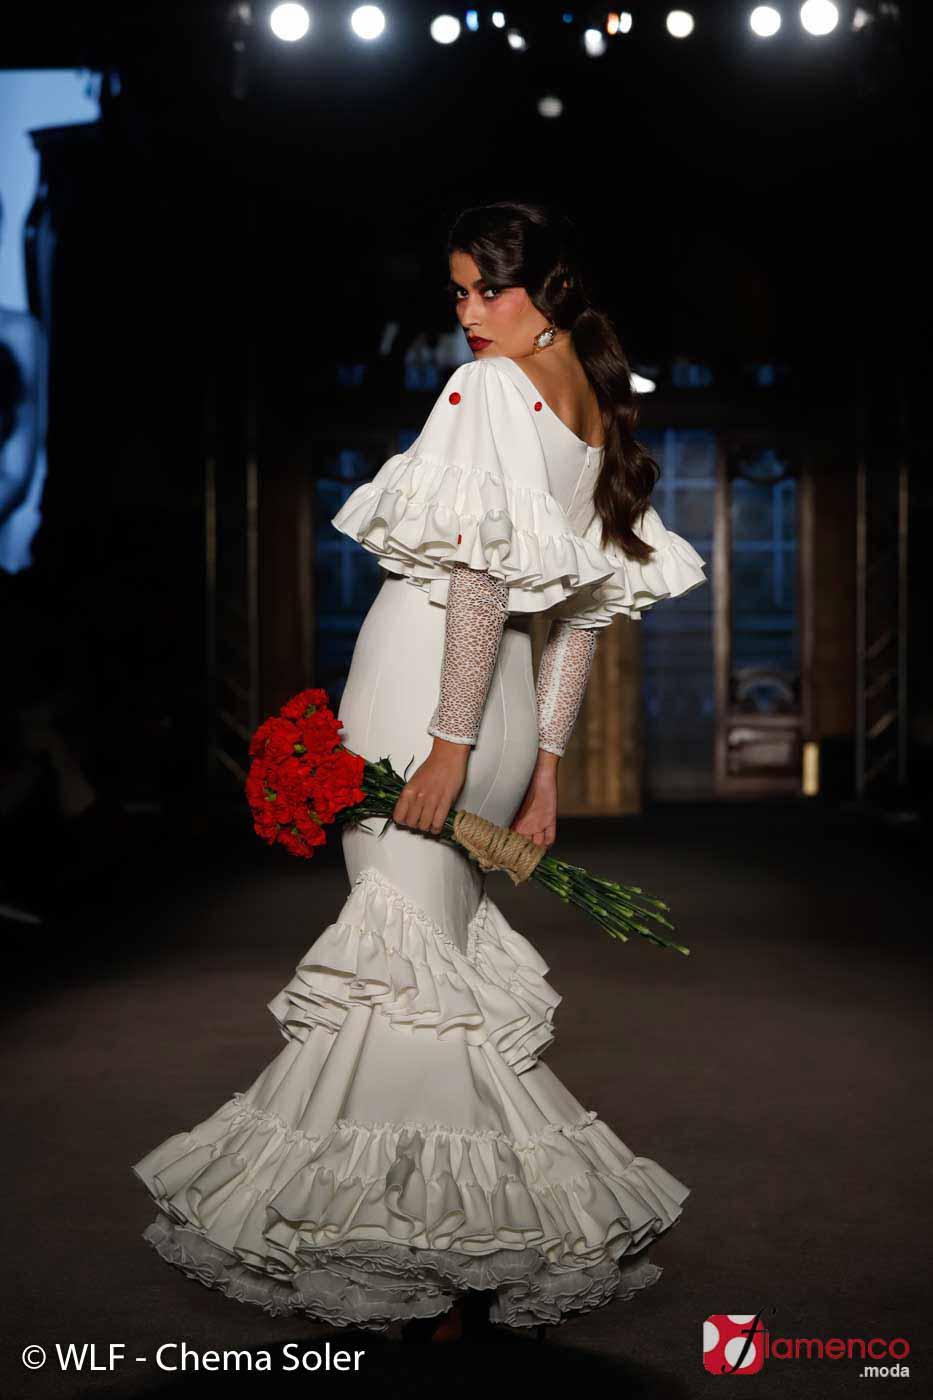 Daniel Robles - We love flamenco 2020